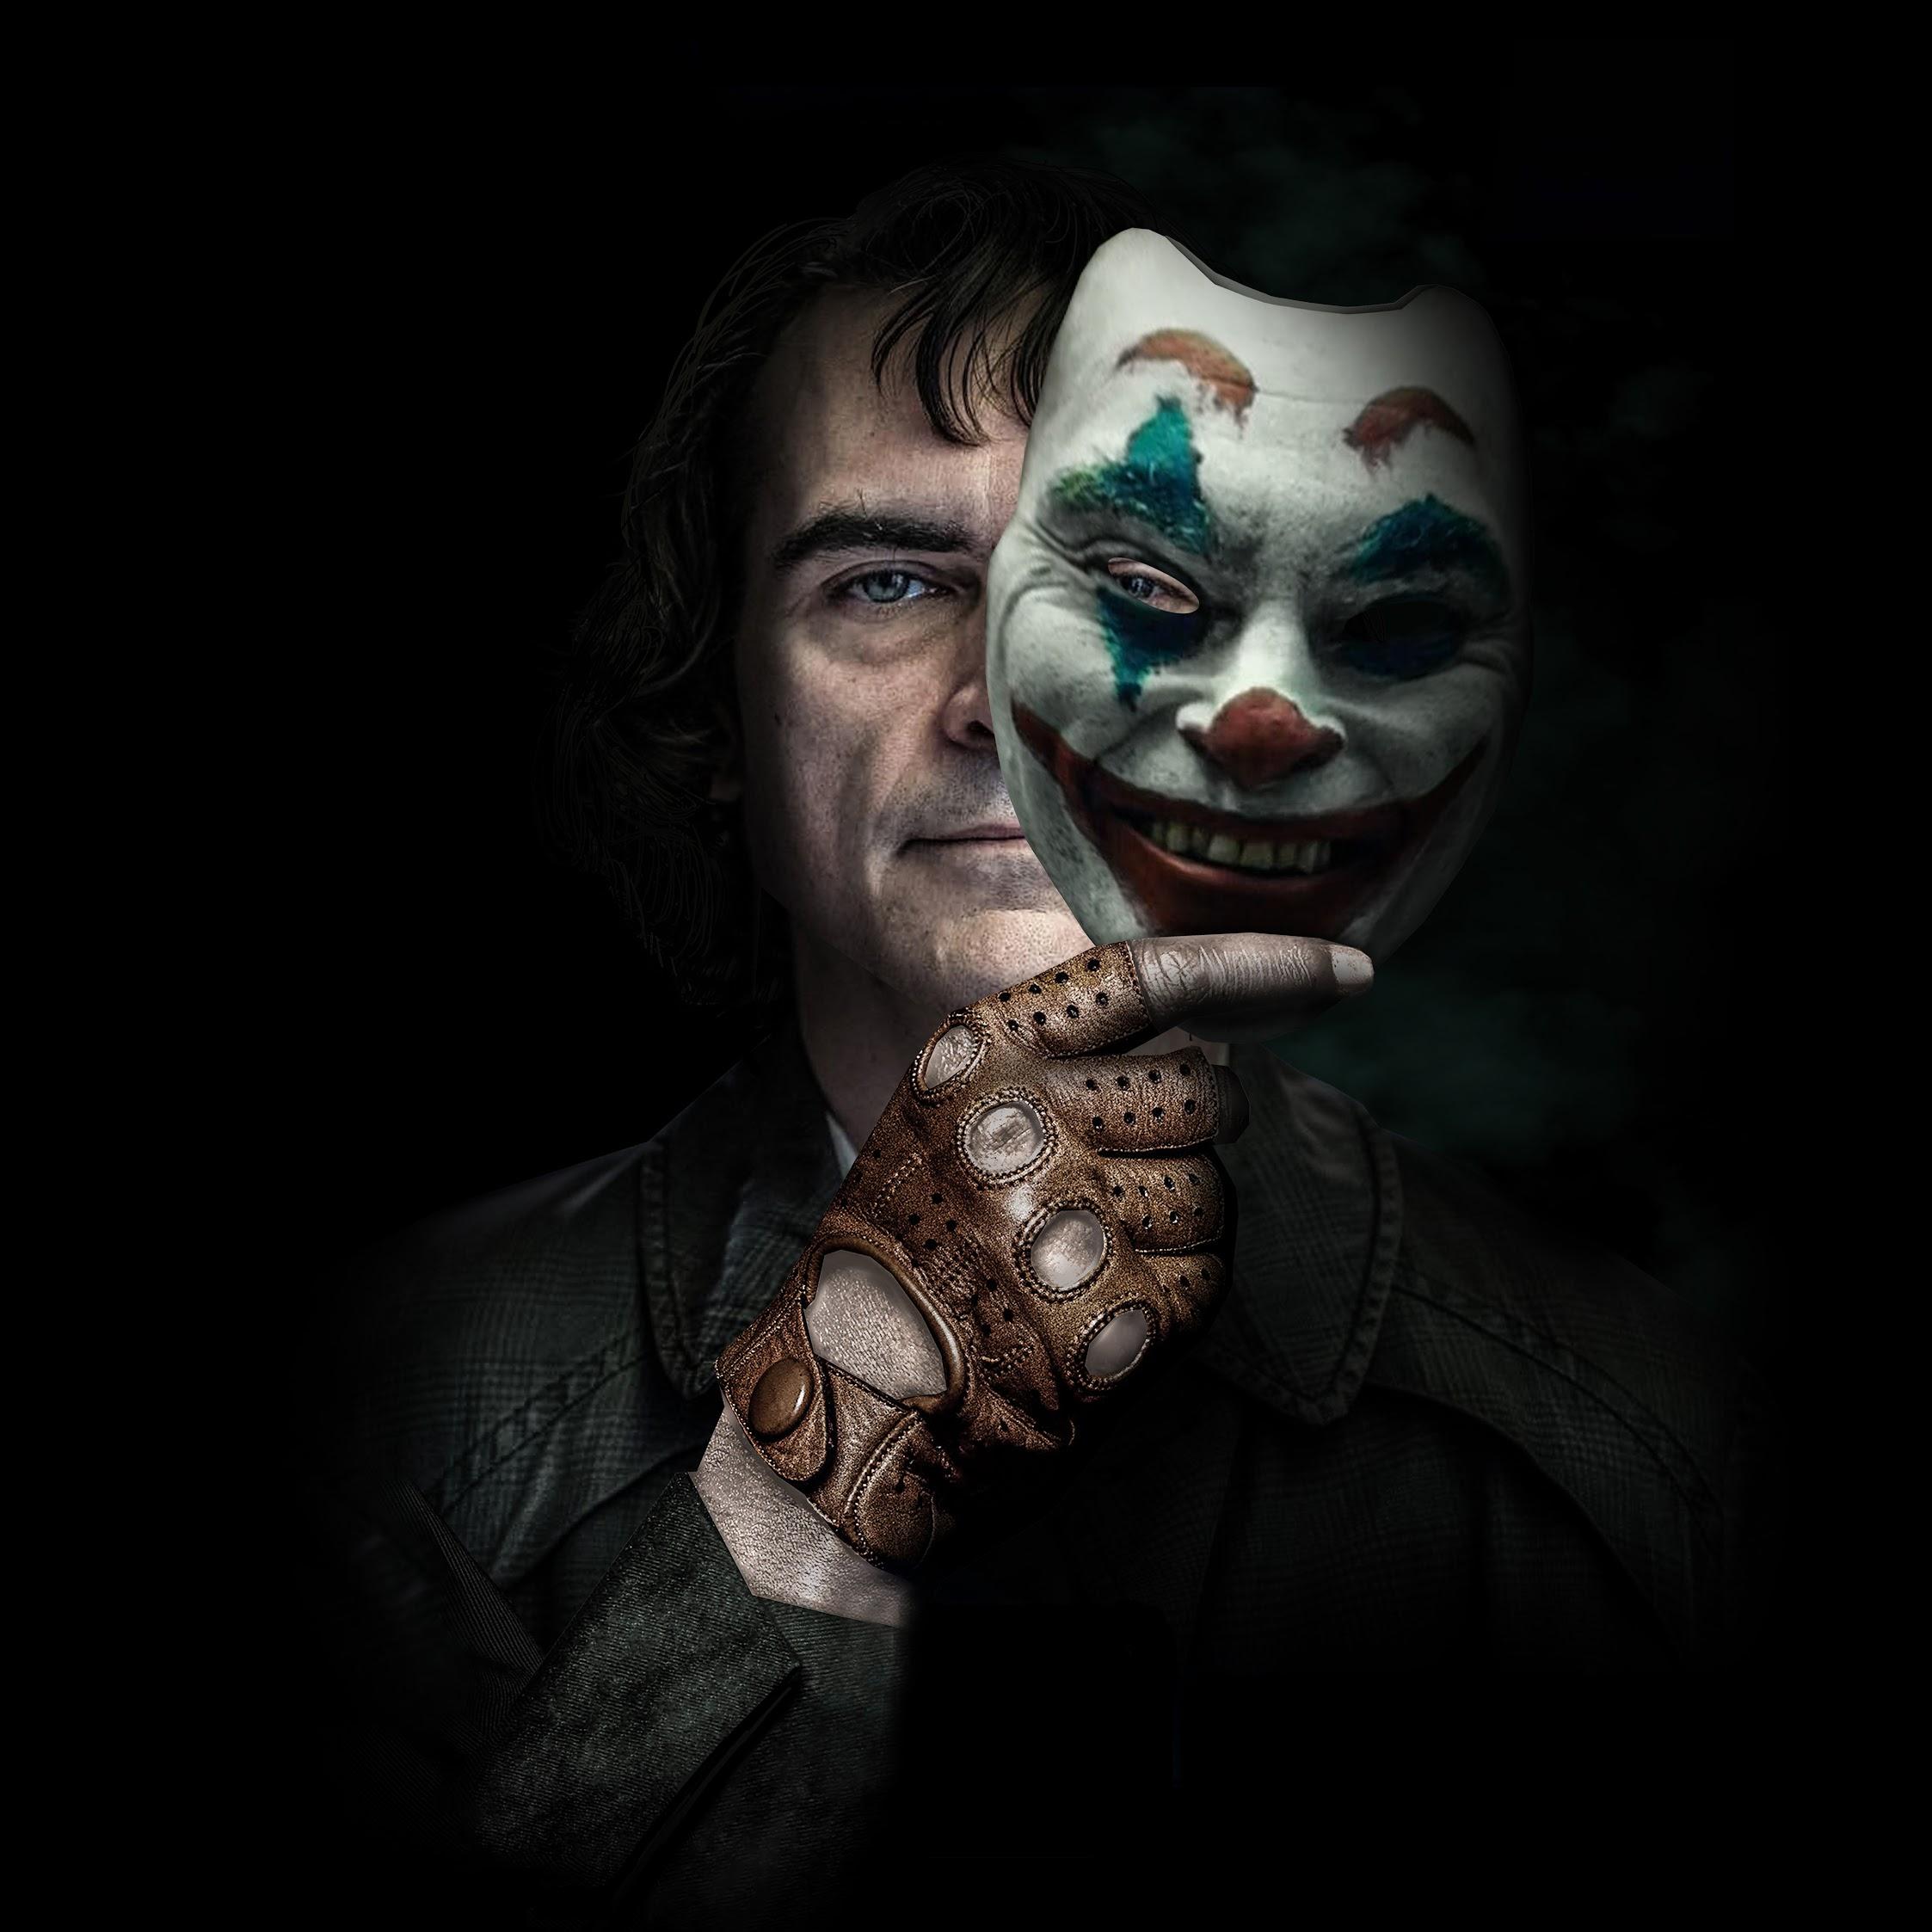 Joker, 2019, Joaquin Phoenix, 8K, #13 Wallpaper